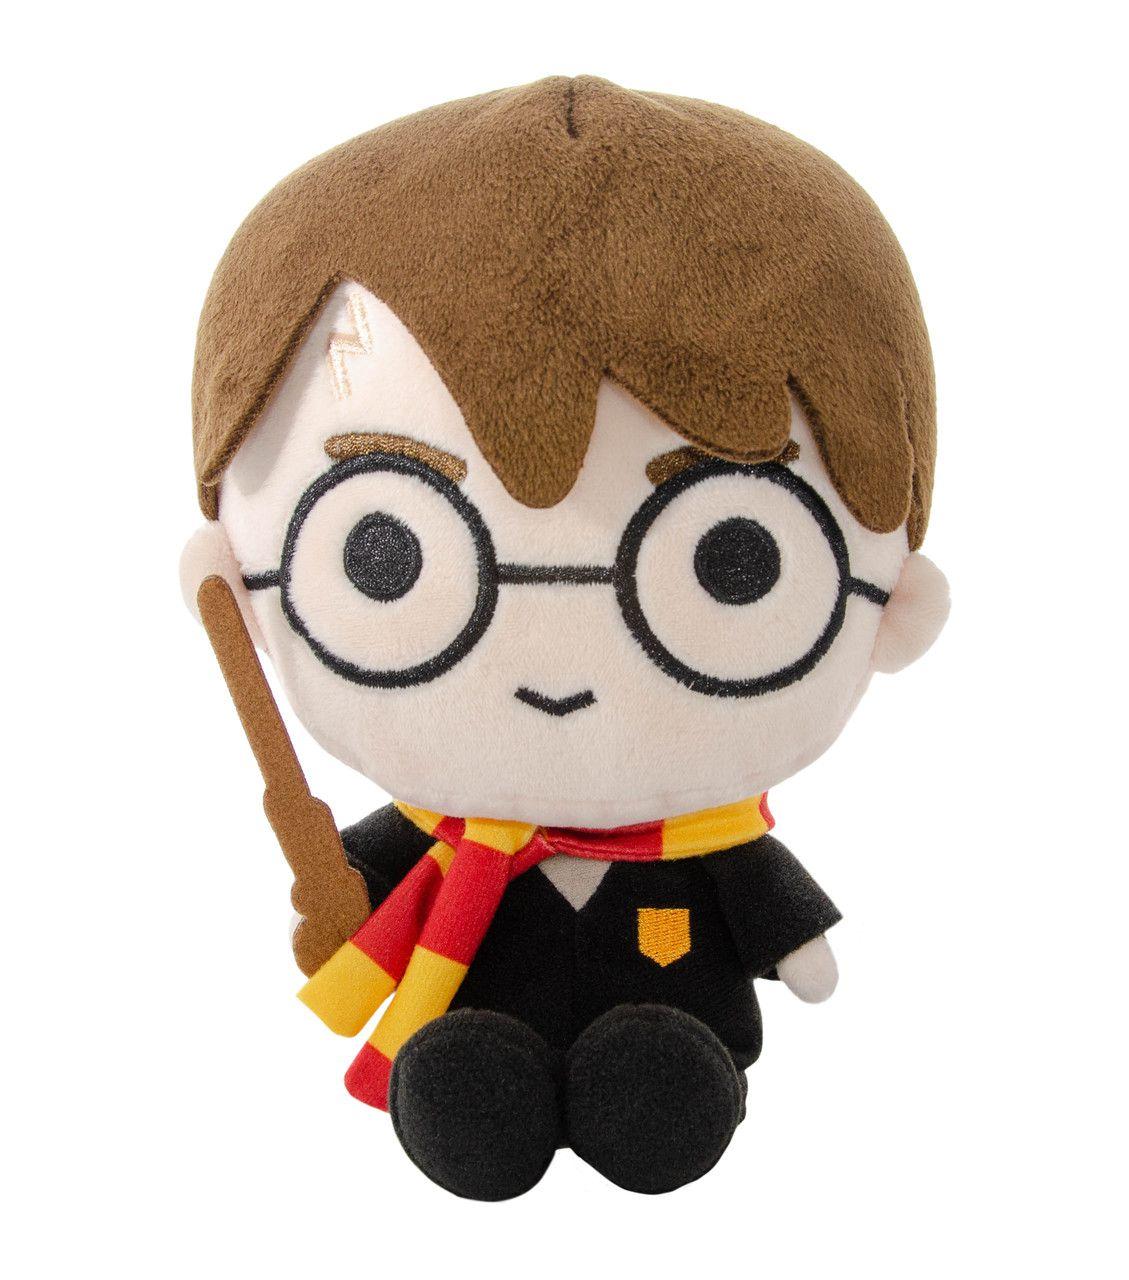 Pelúcia Harry Potter Wizarding World - Plush Charms (Apenas Venda Online)